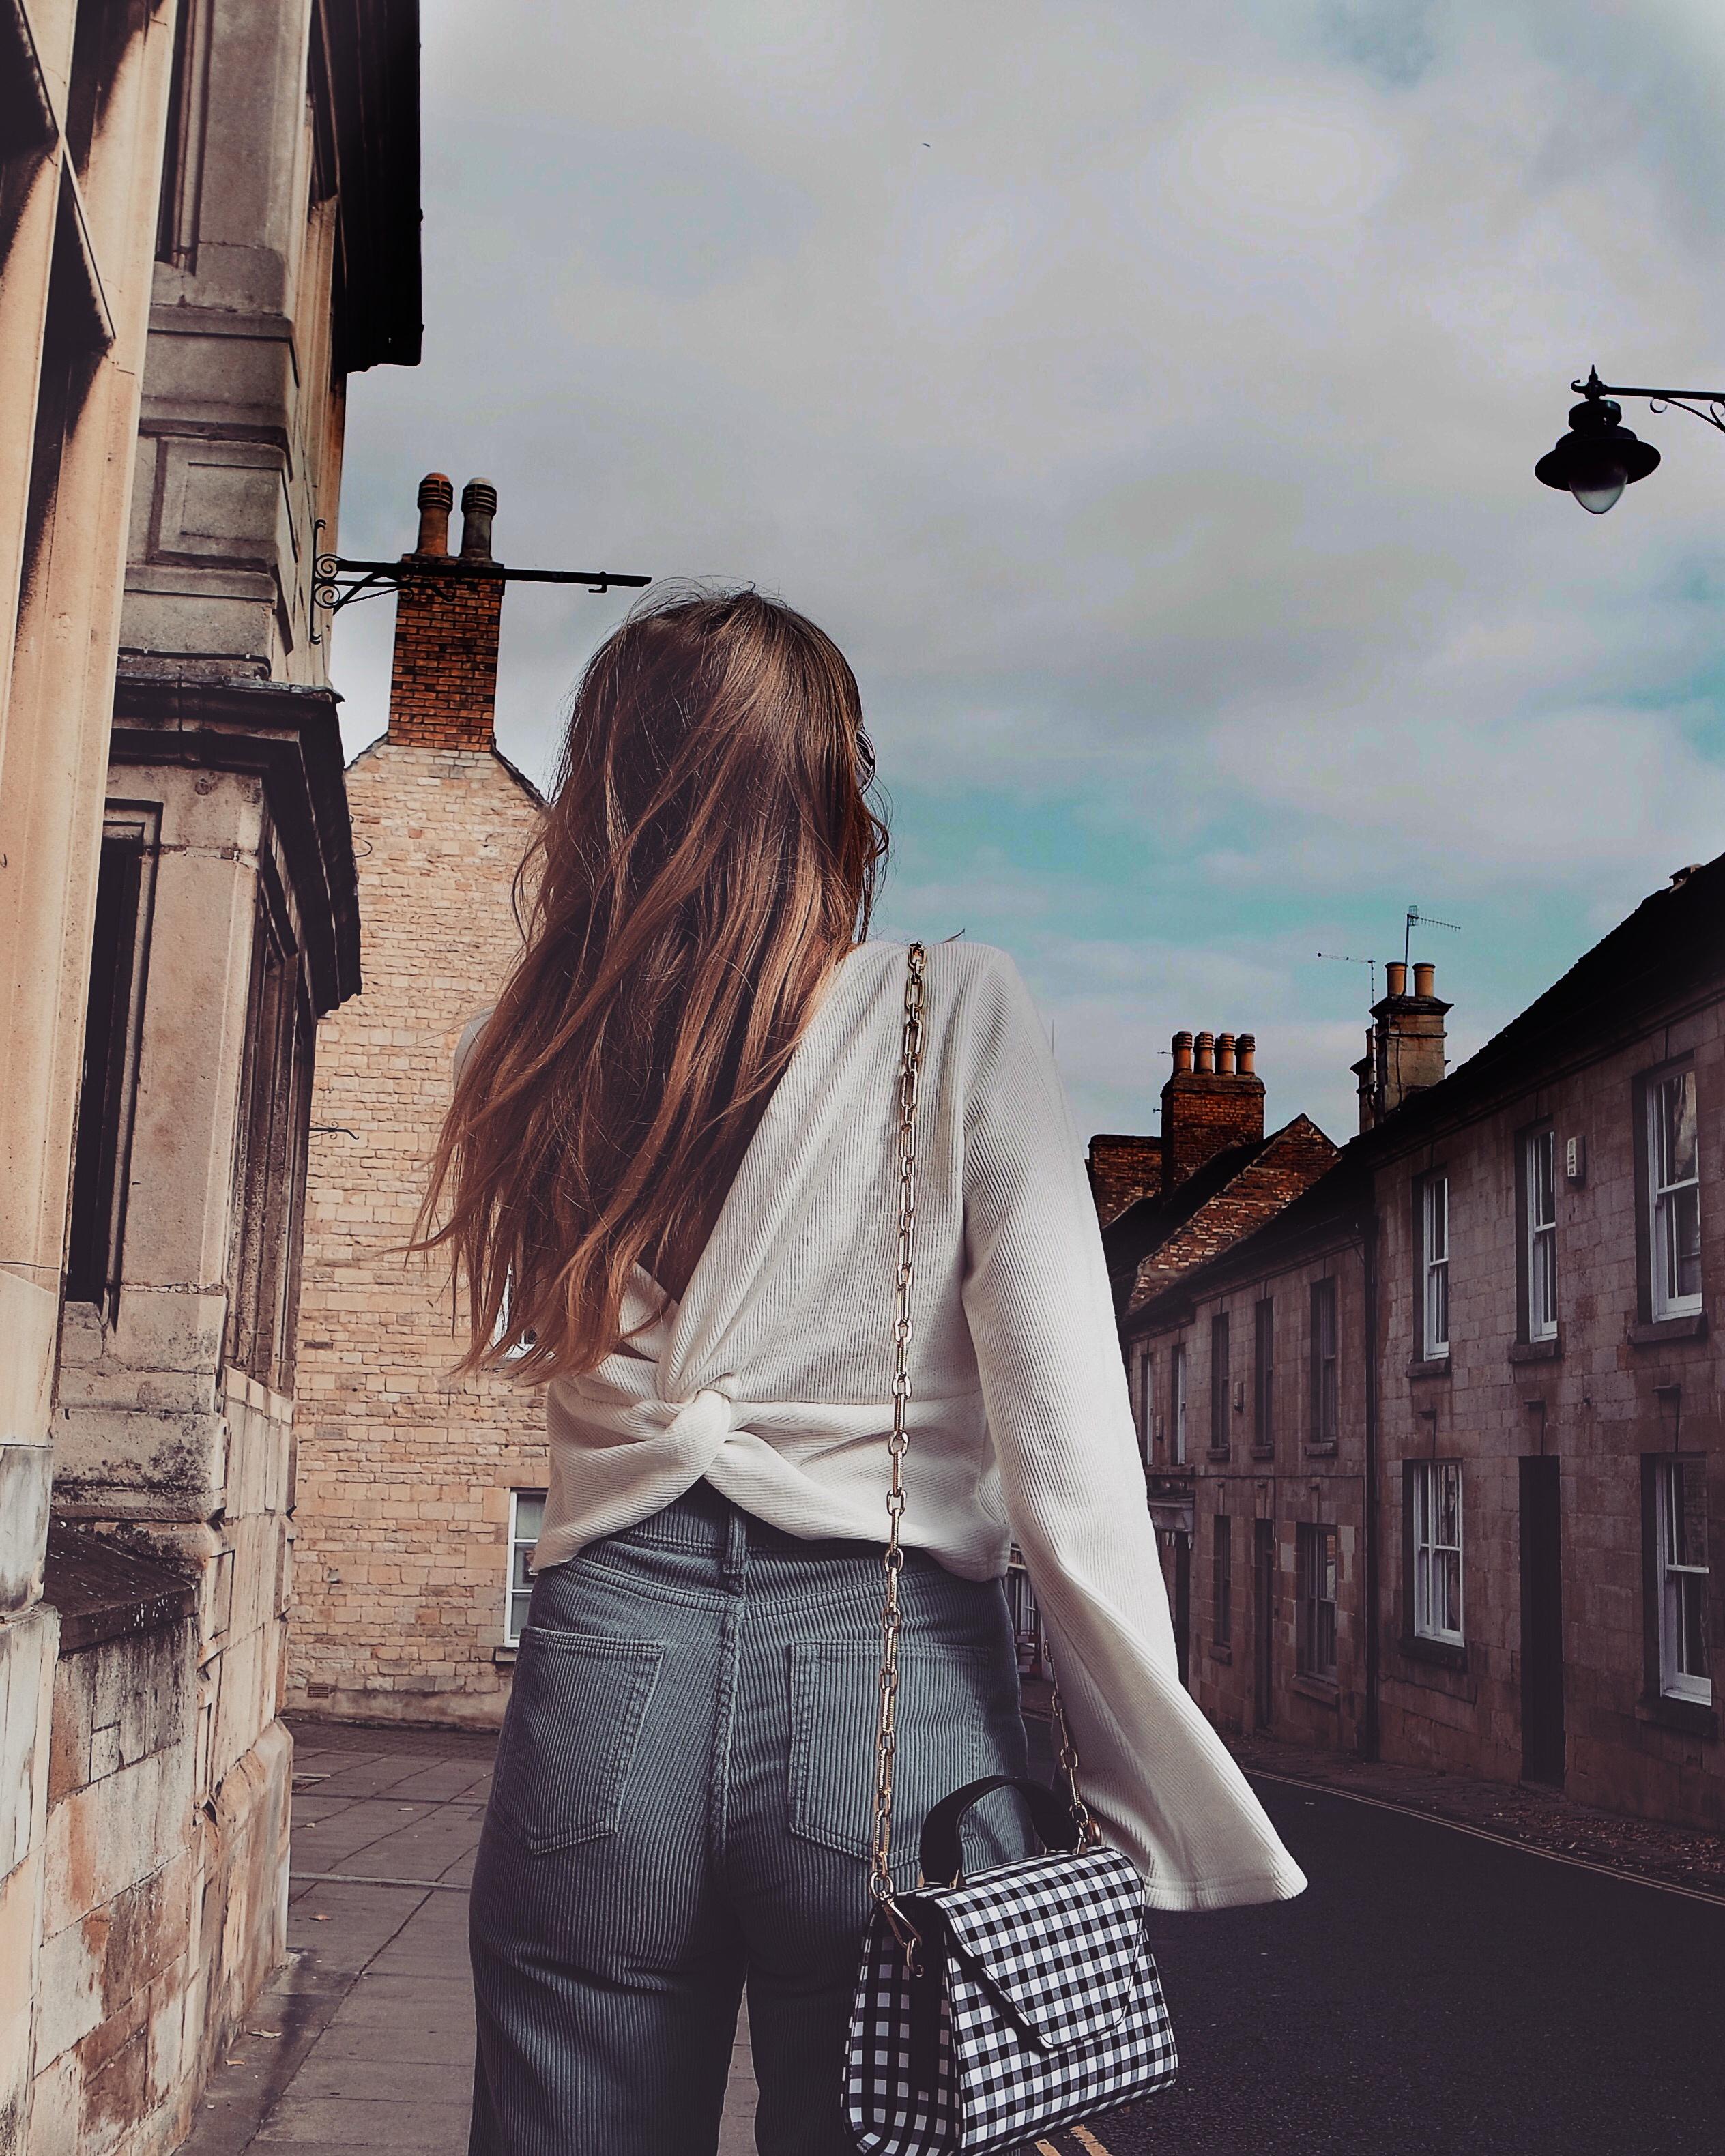 Corduroy Trousers - Gingham Handbag